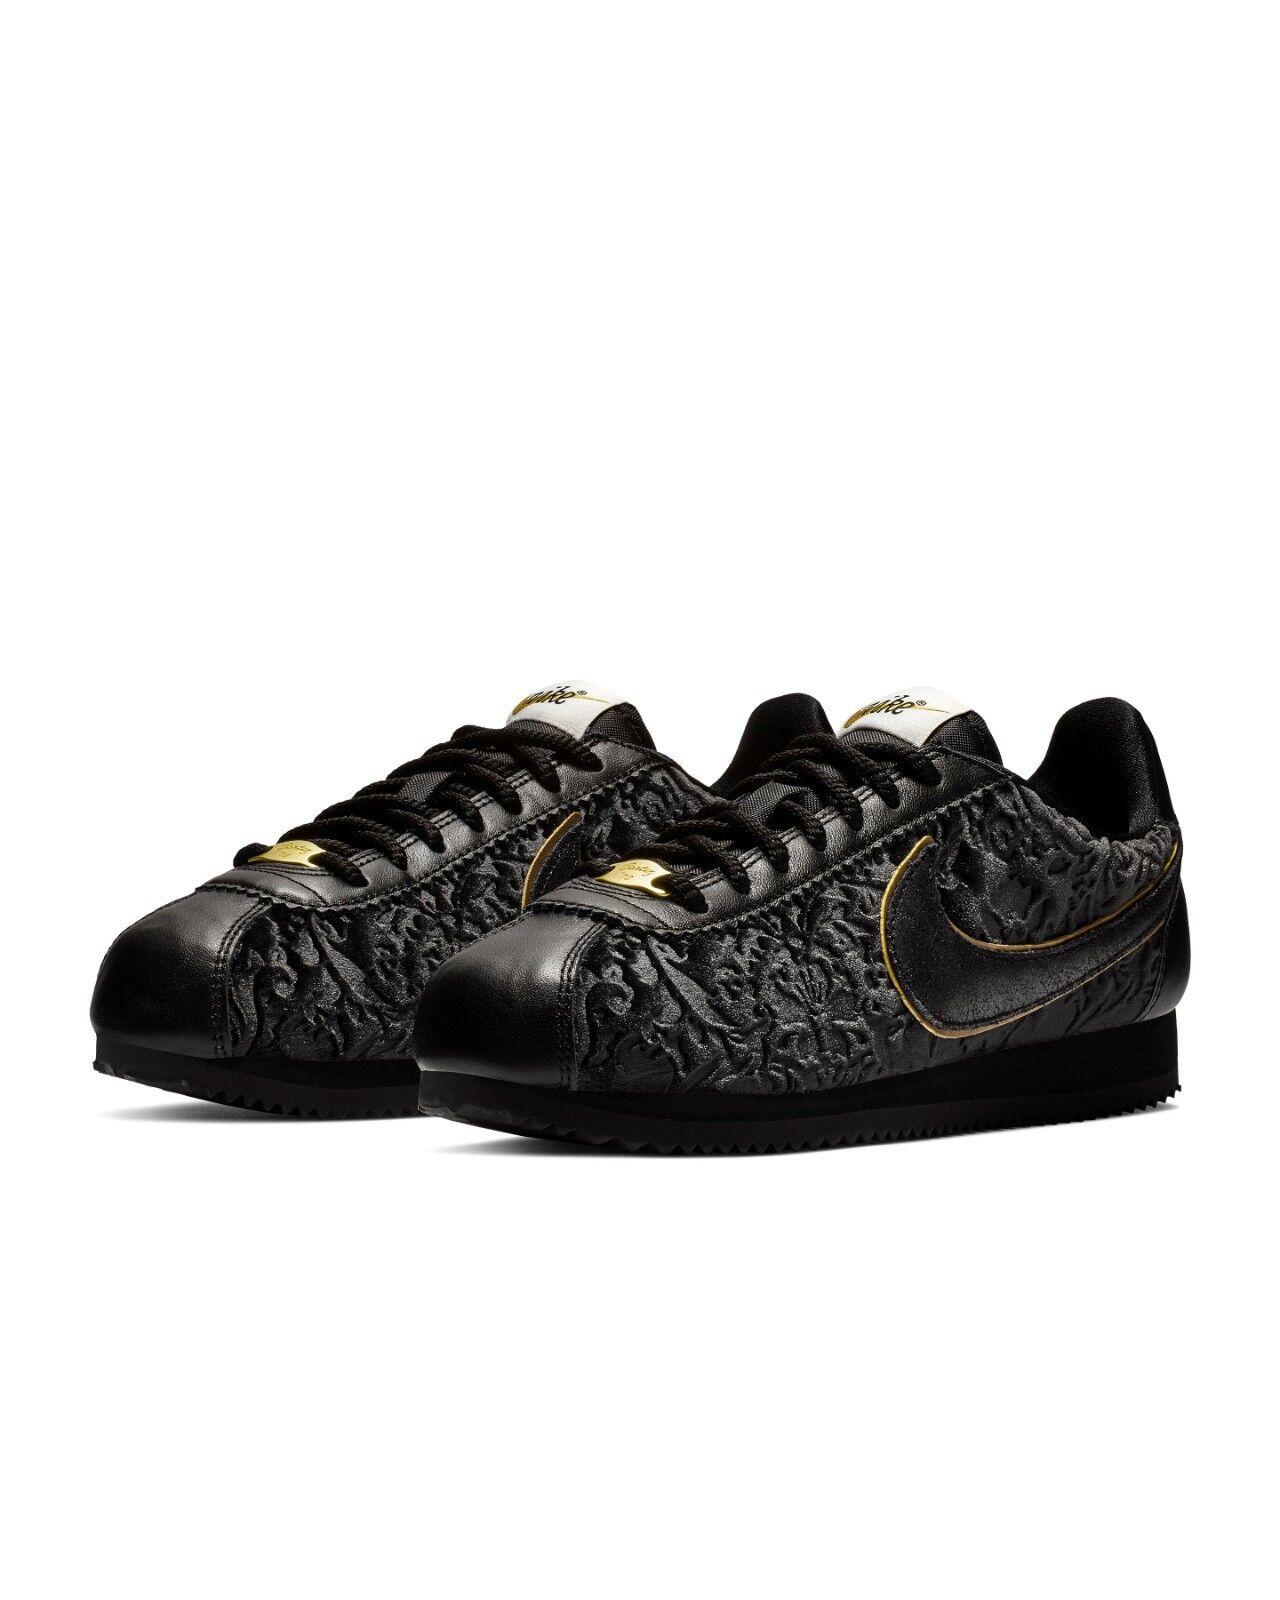 Nike Classic Cortez Sneakers Women's Women's Women's Casual Lifestyle Comfy shoes 70762b